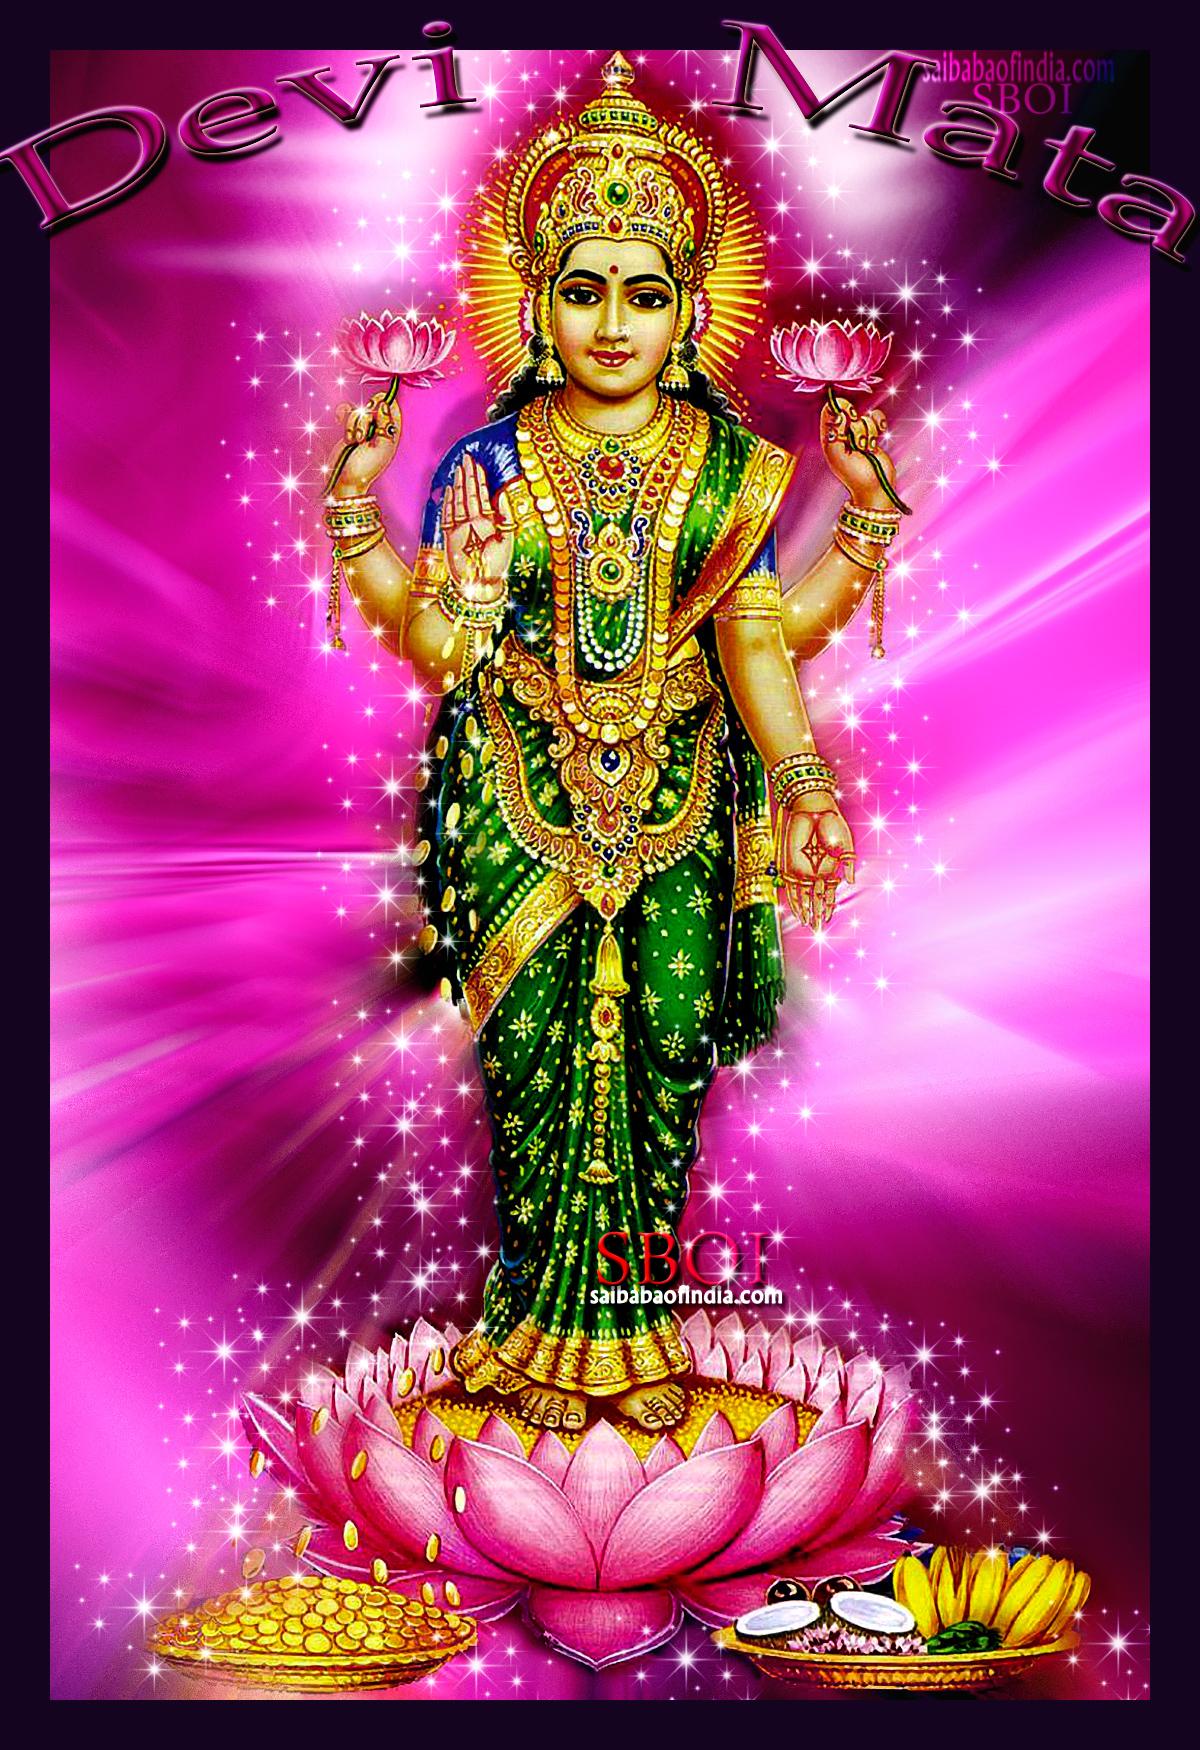 Devi Ma Jai Mata Di Navaratri Photos Wallpapers Animation